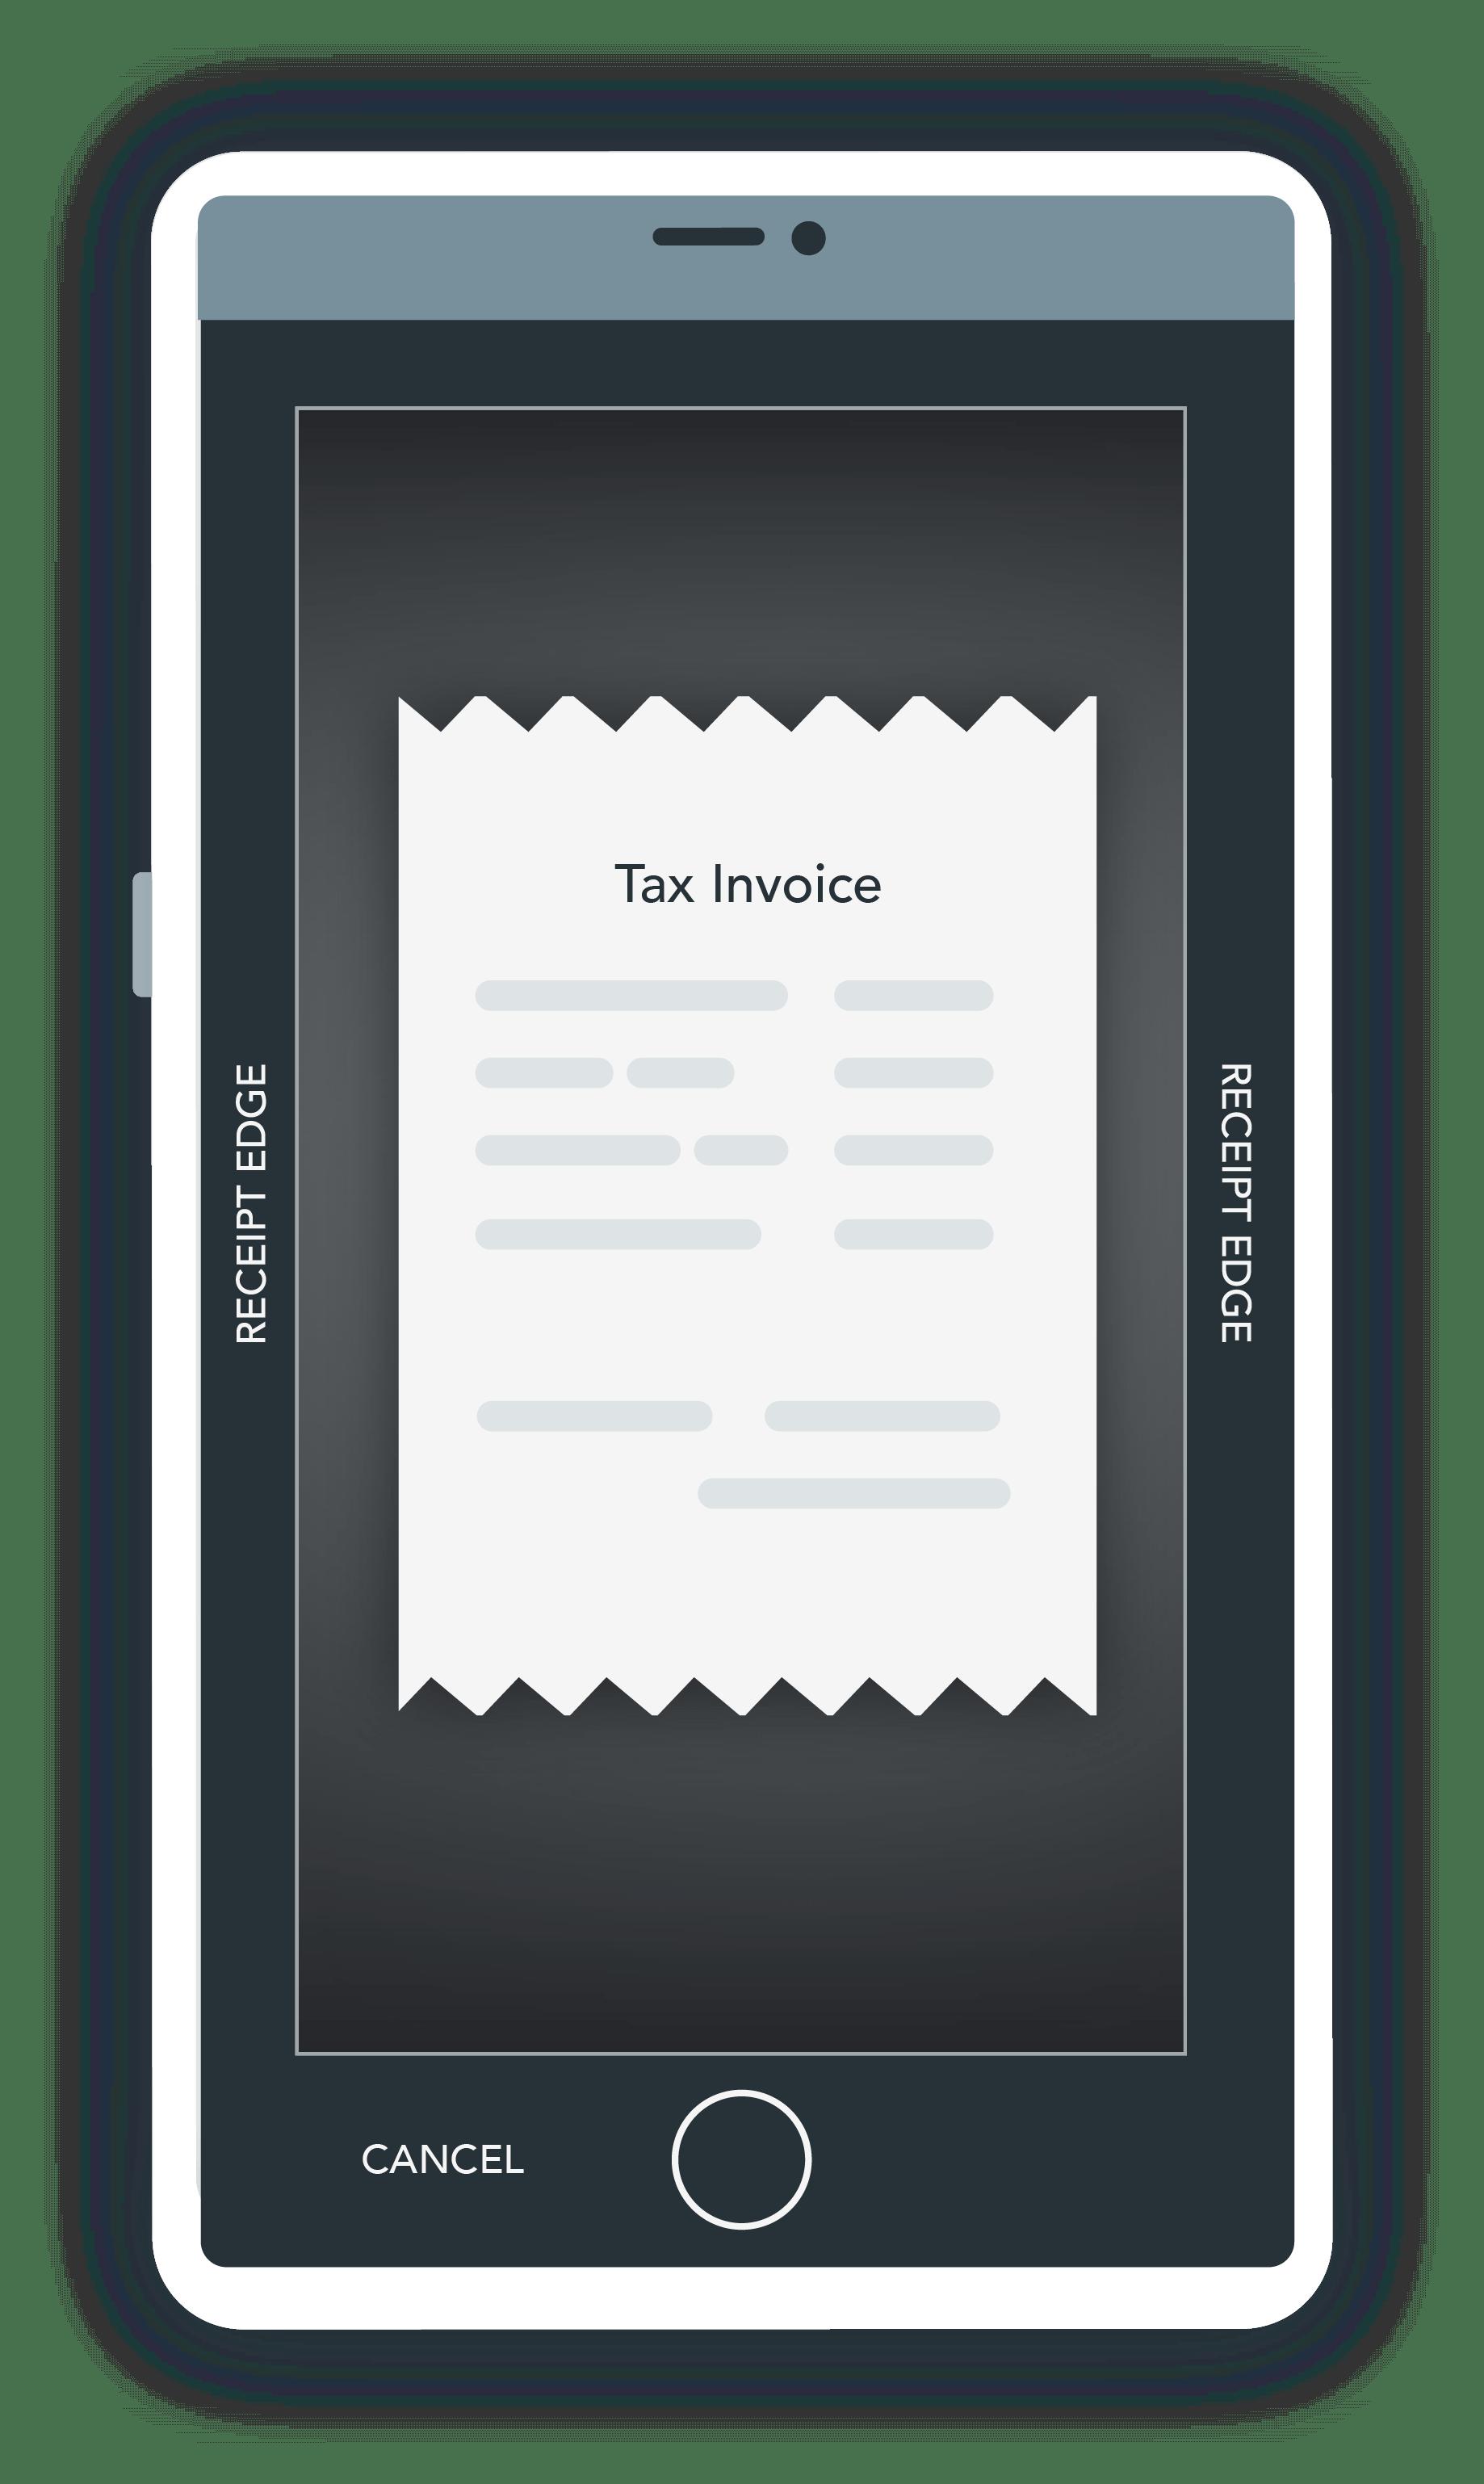 Capture transaction receipts